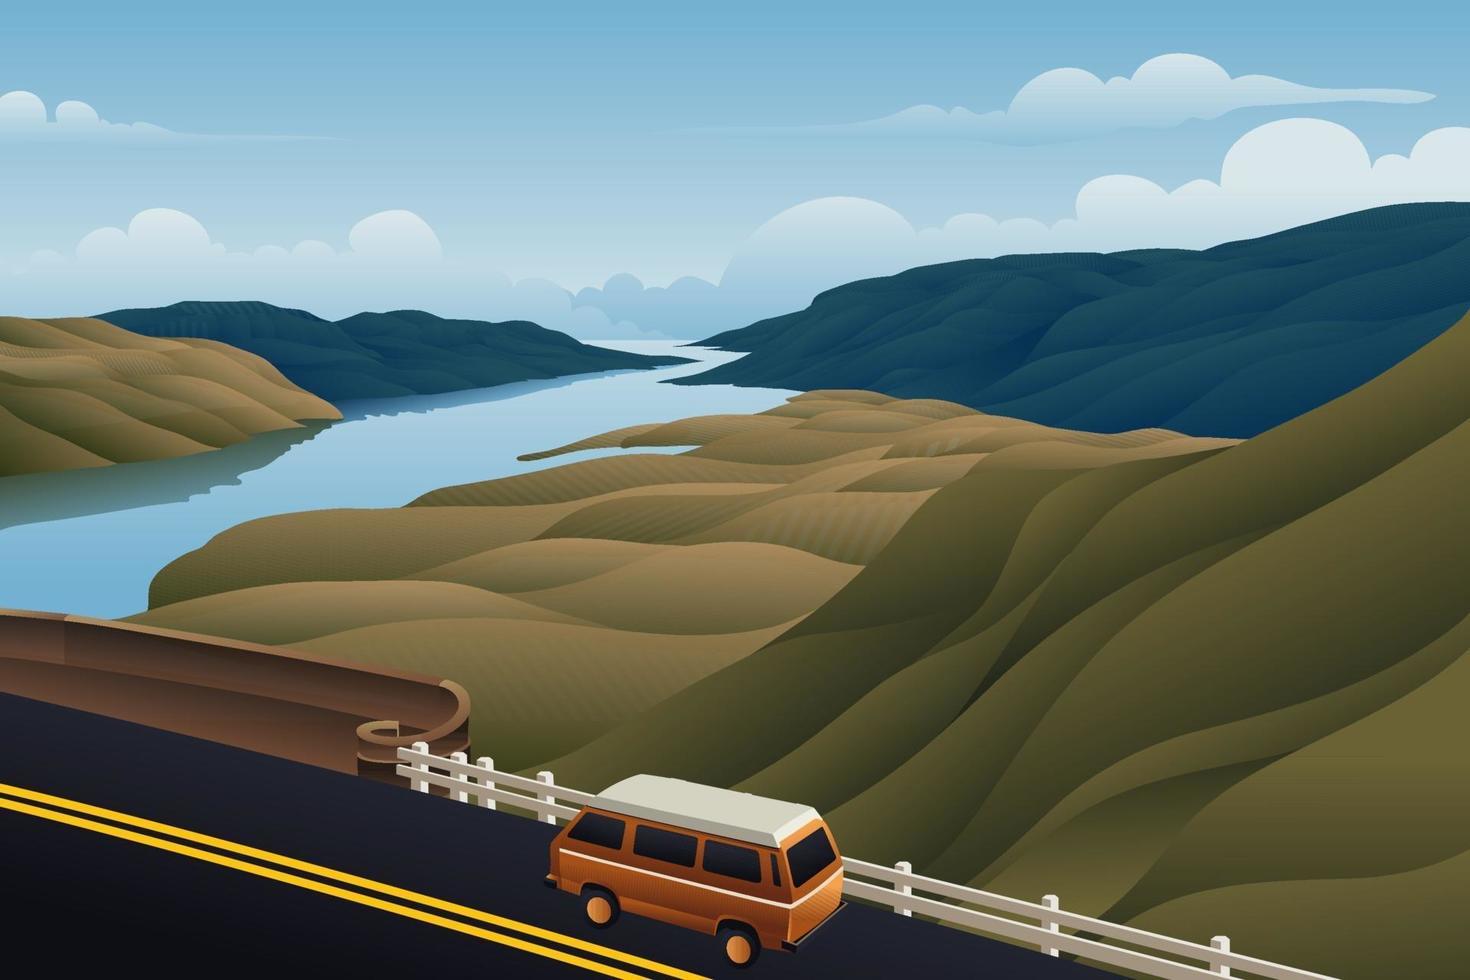 buss på bron berget floden vektor